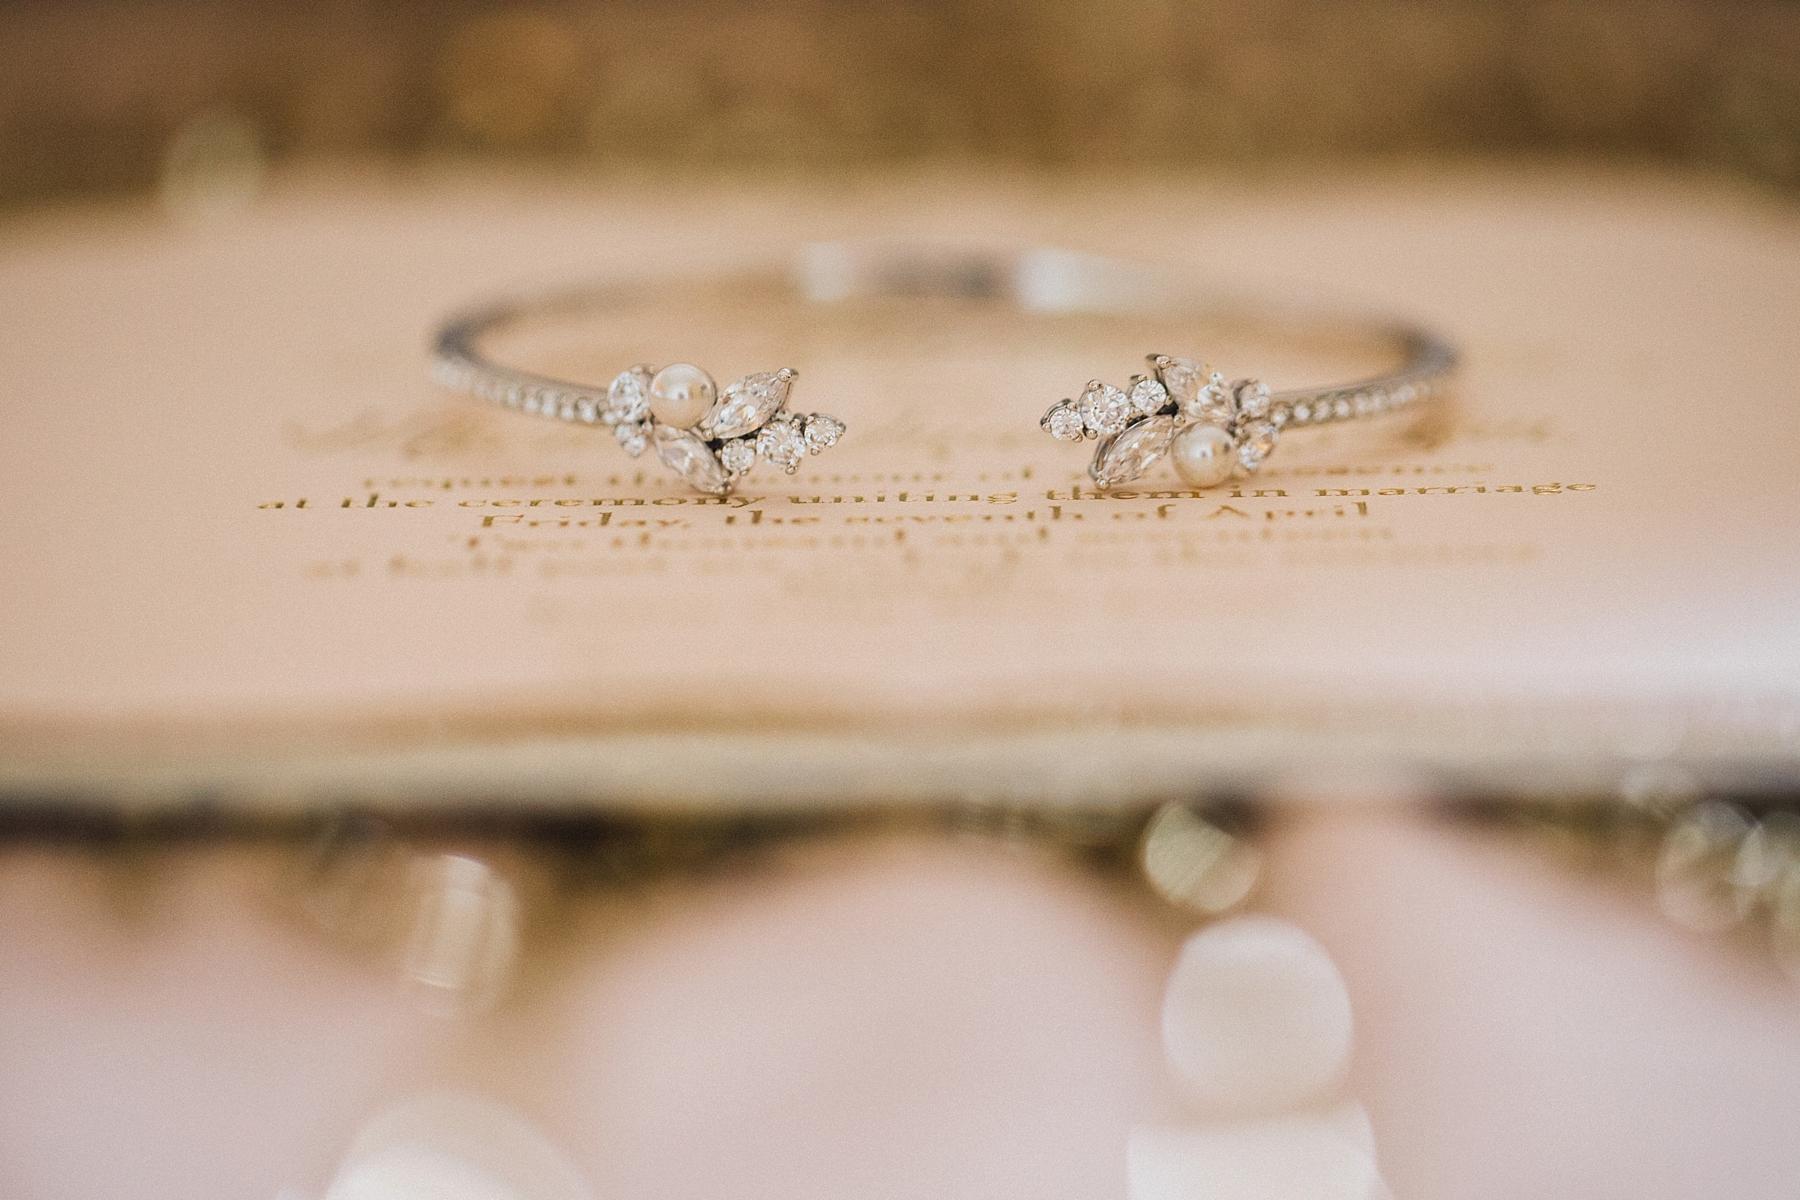 jersey-city-nj-wedding-photographer-top_0006.jpg